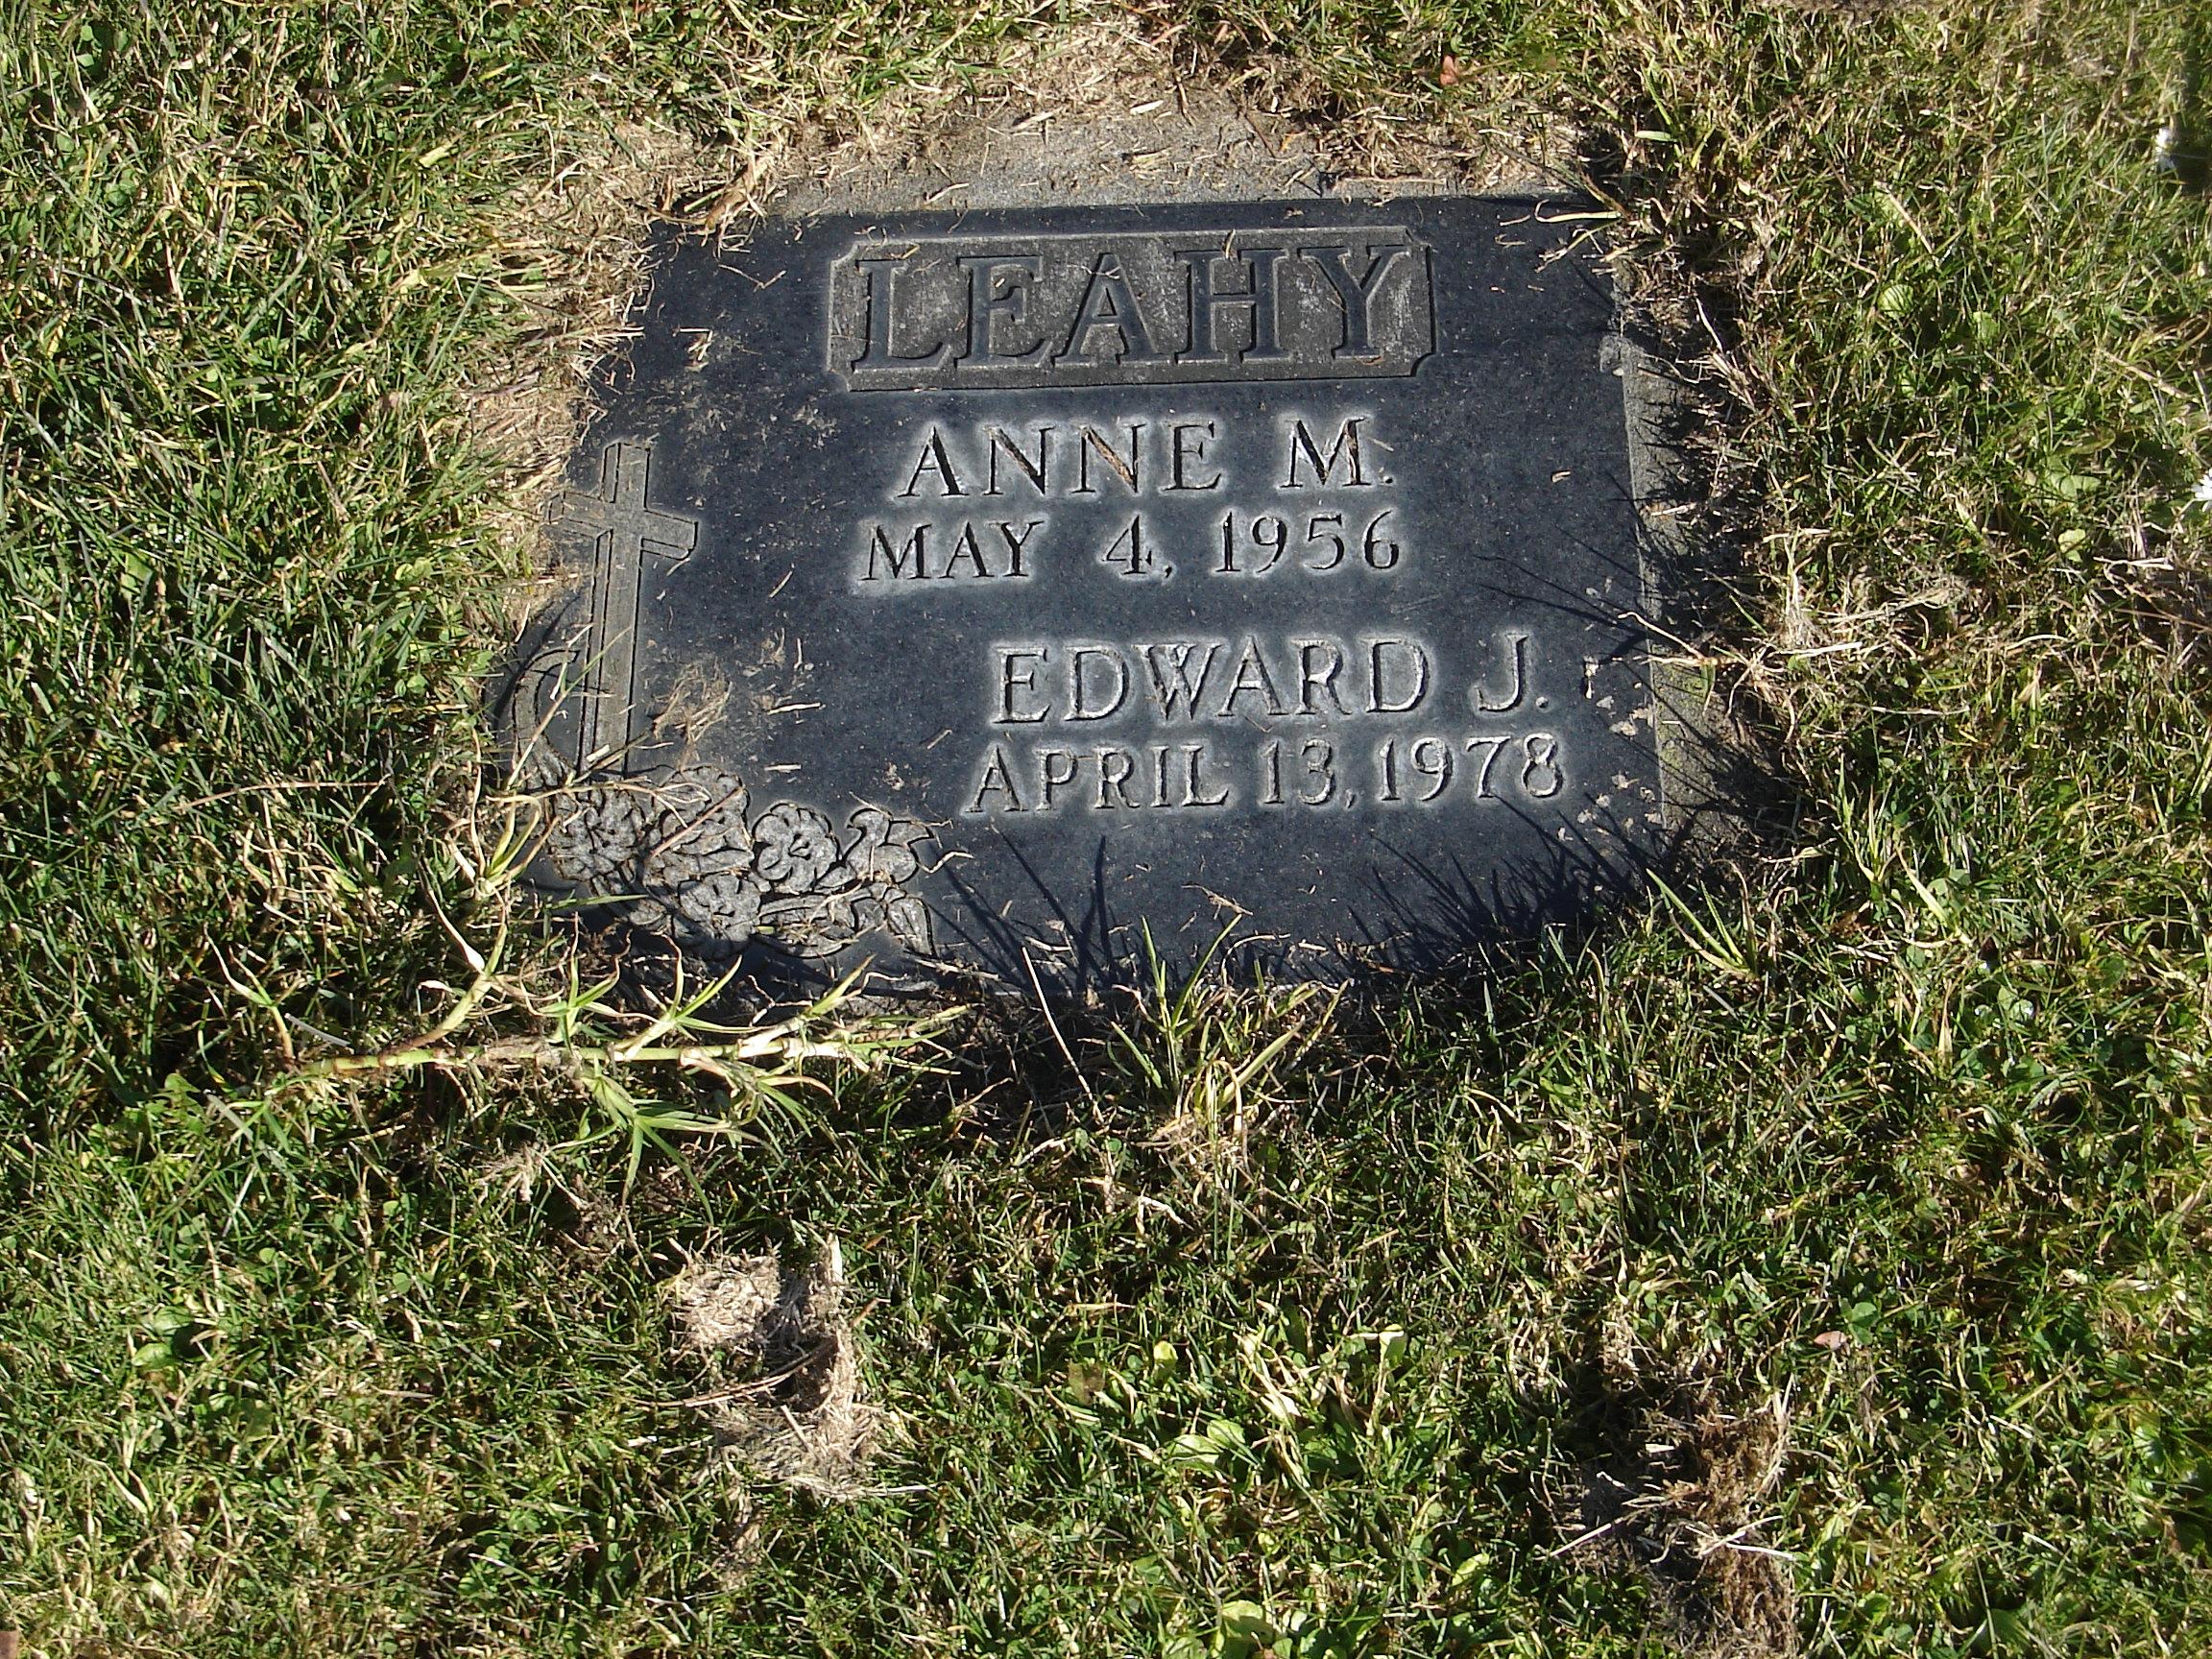 Anne M <i>St Leger</i> Leahy